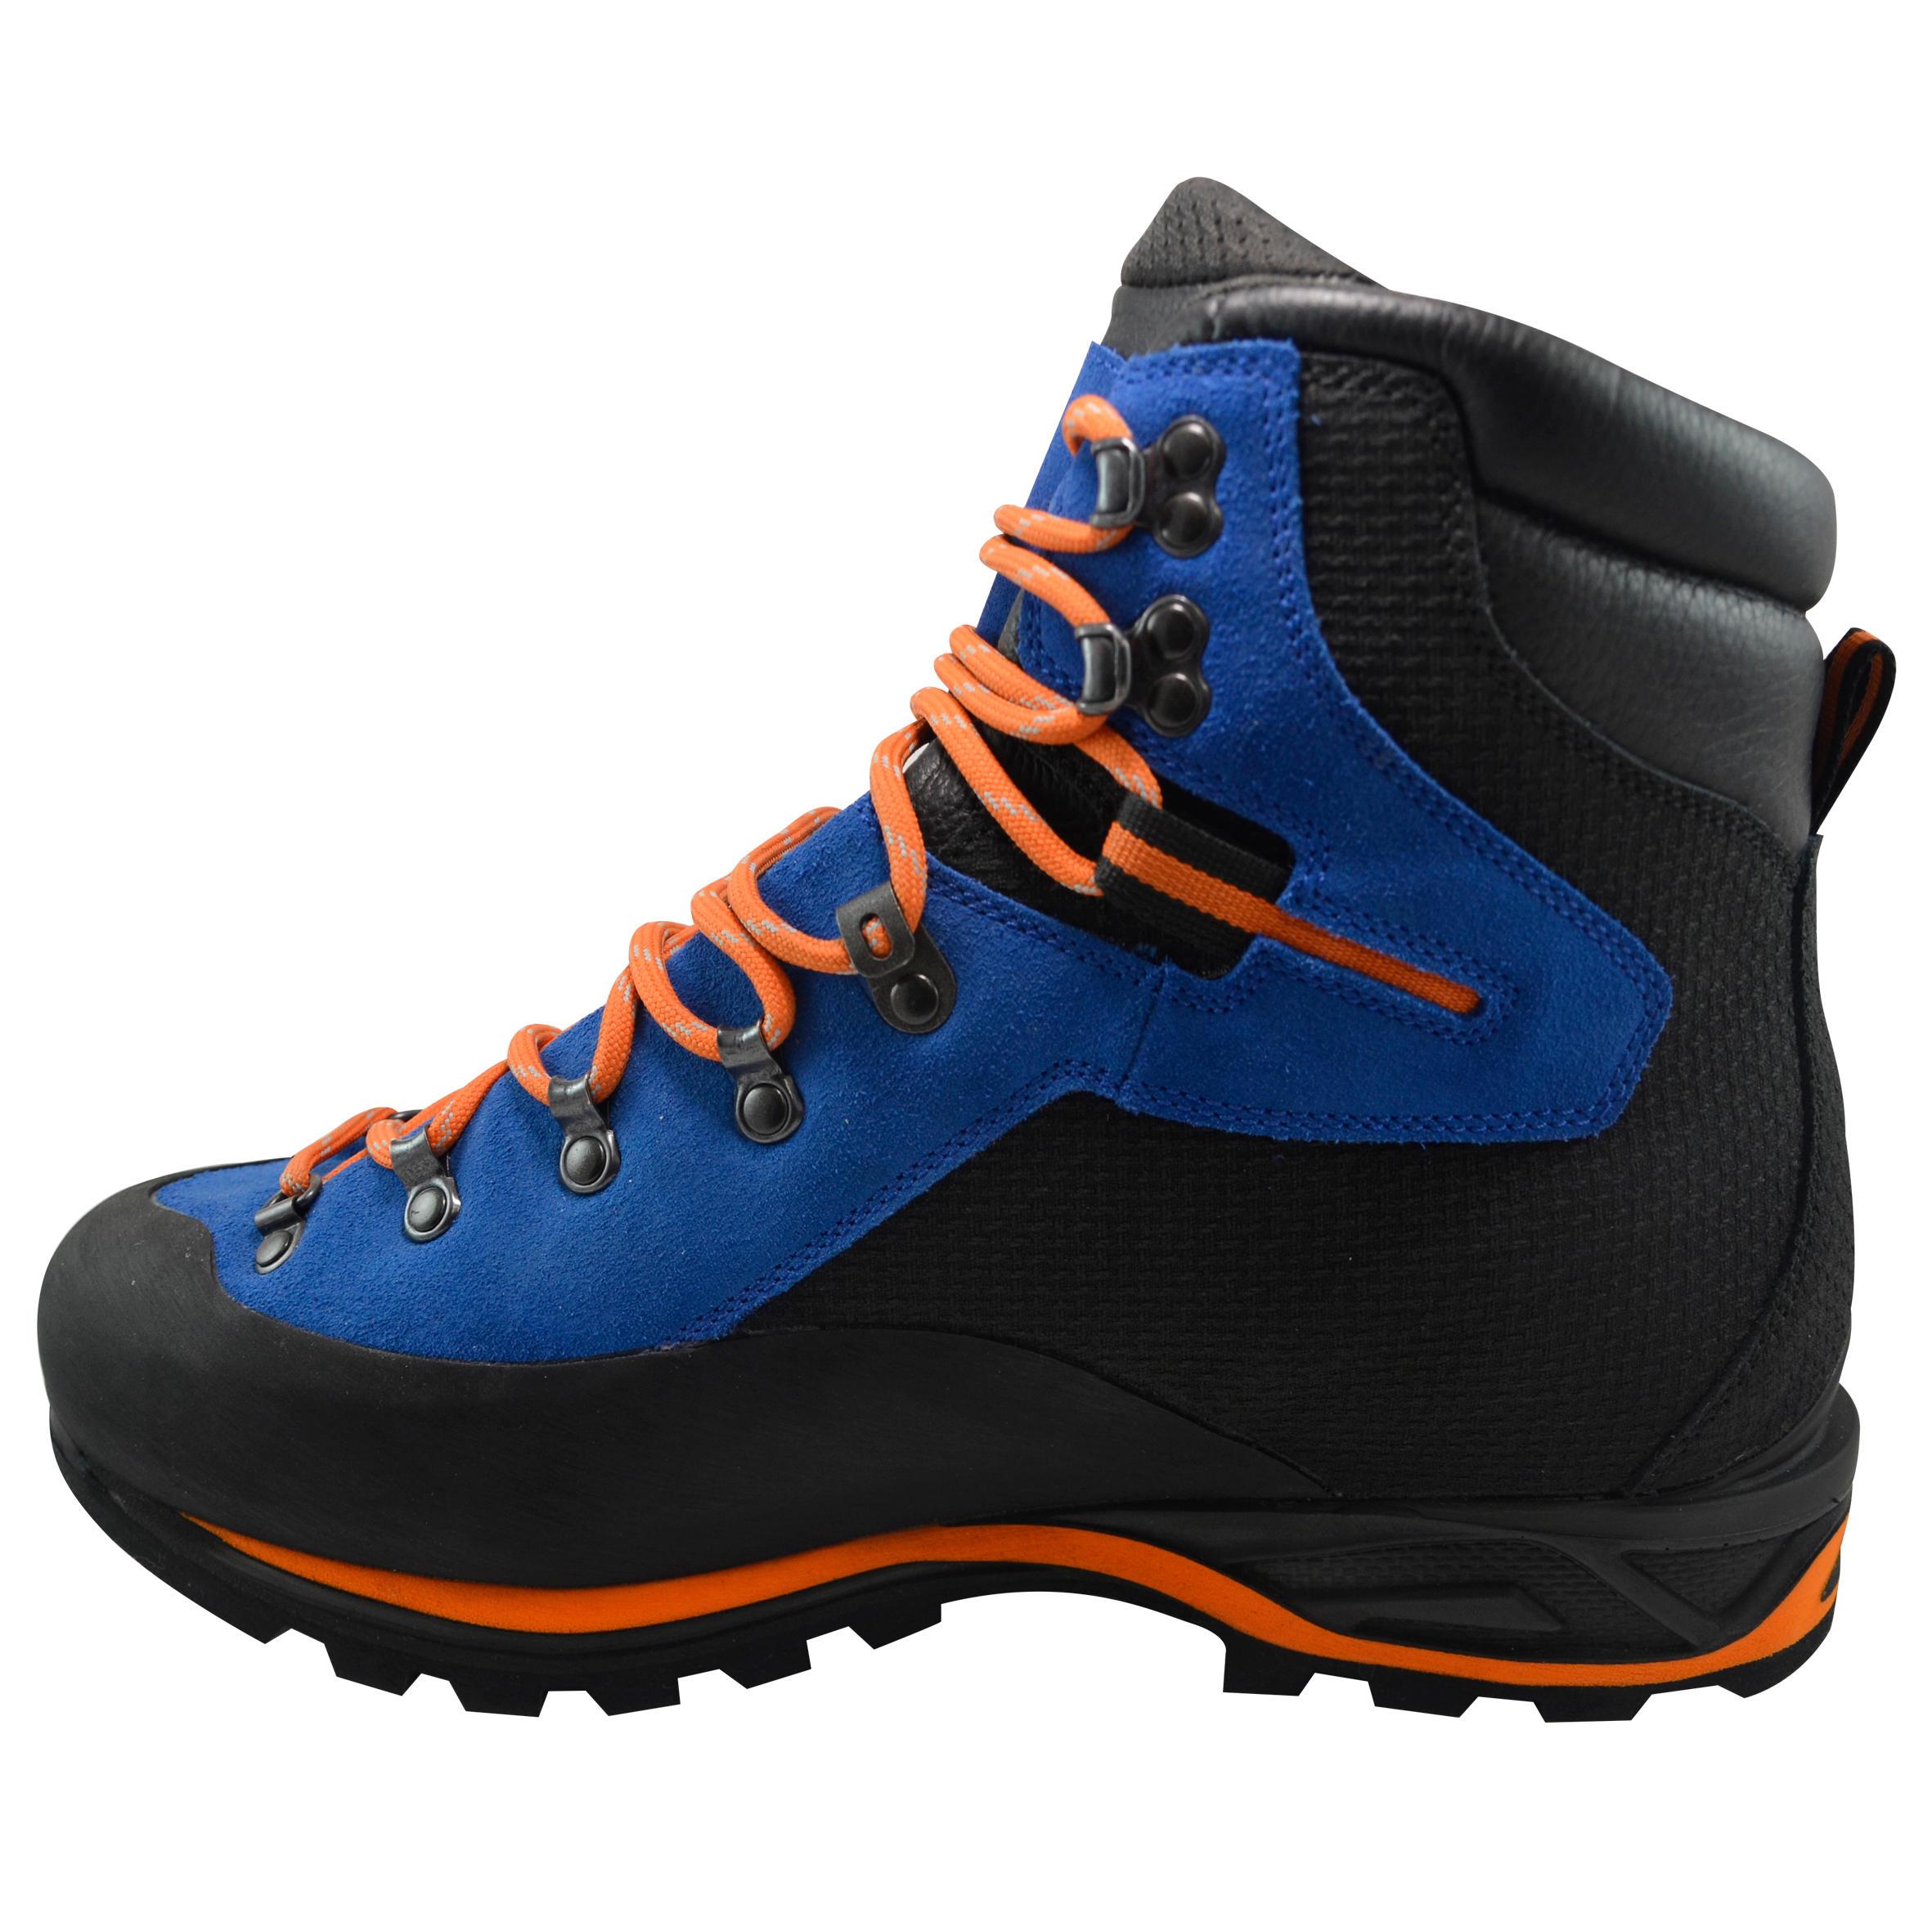 Bleues Chaussures Bleues Chaussures Alpinisme Chaussures Alpinisme Alpinisme Alpinisme Bleues Chaussures VSUGMqLzp